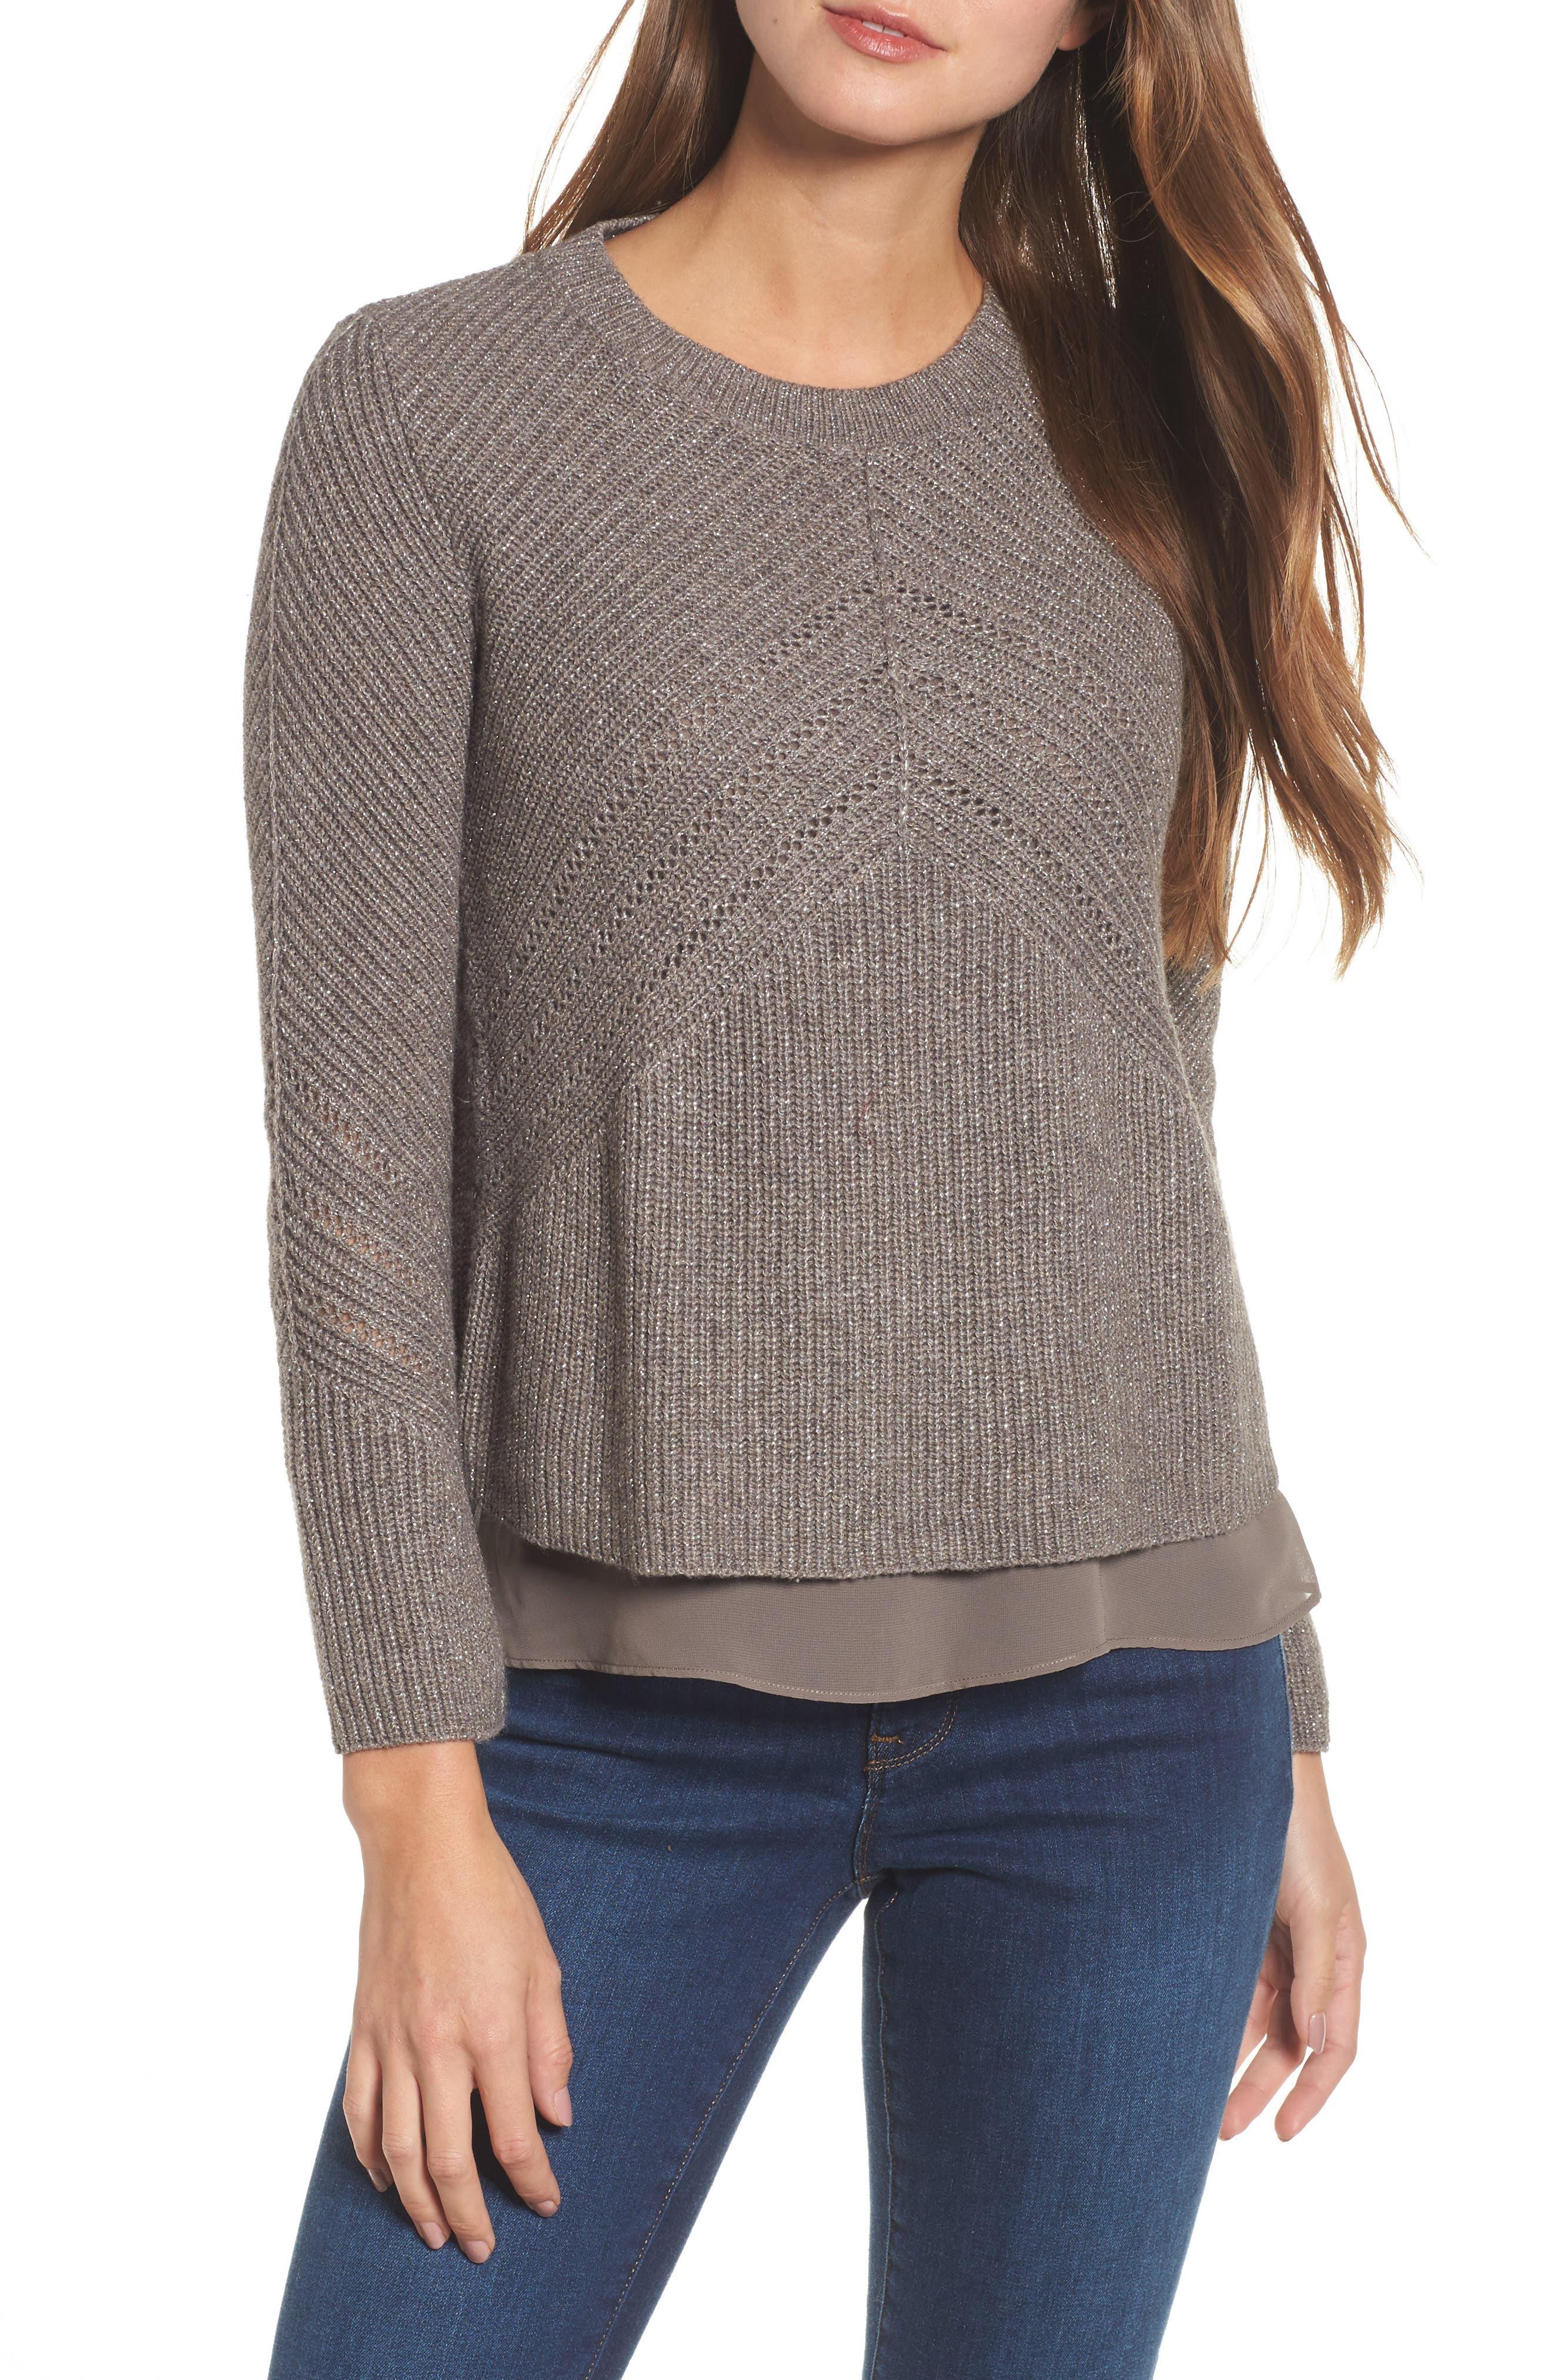 Lucky Brand Nico Layered Look Sweater